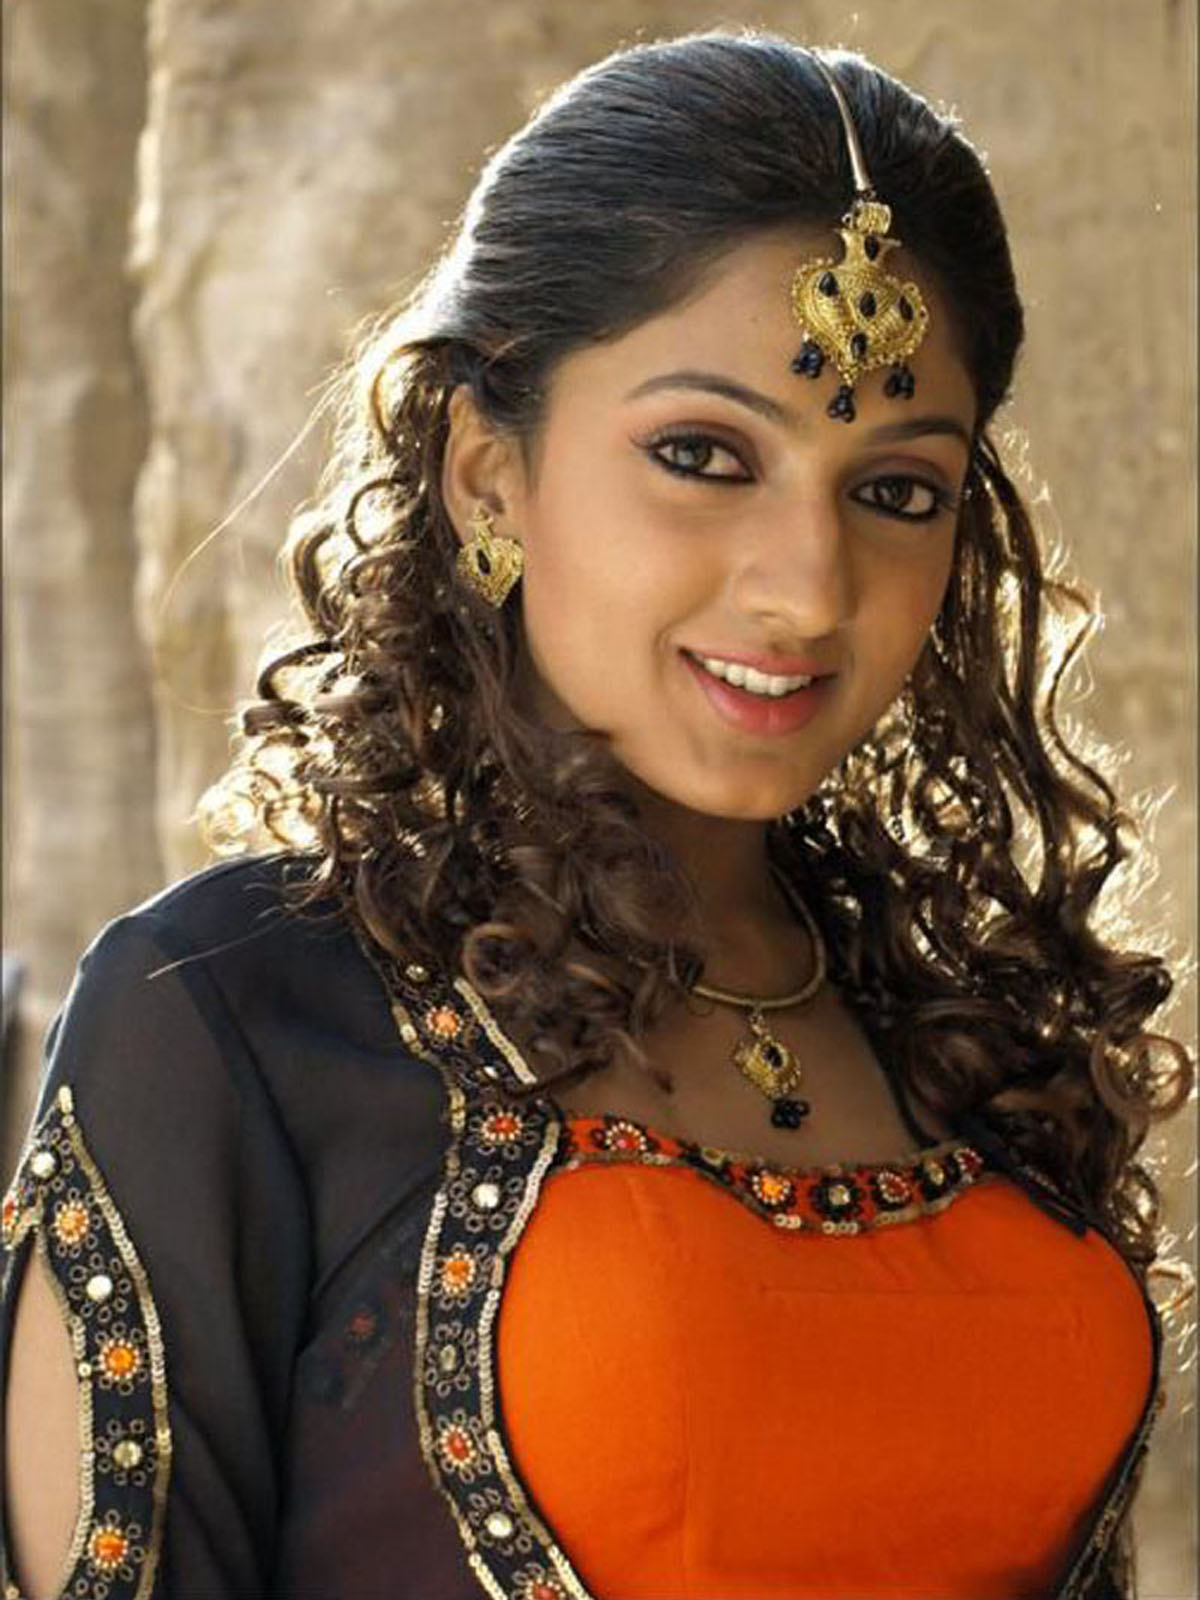 Sheela kaur hair style photos